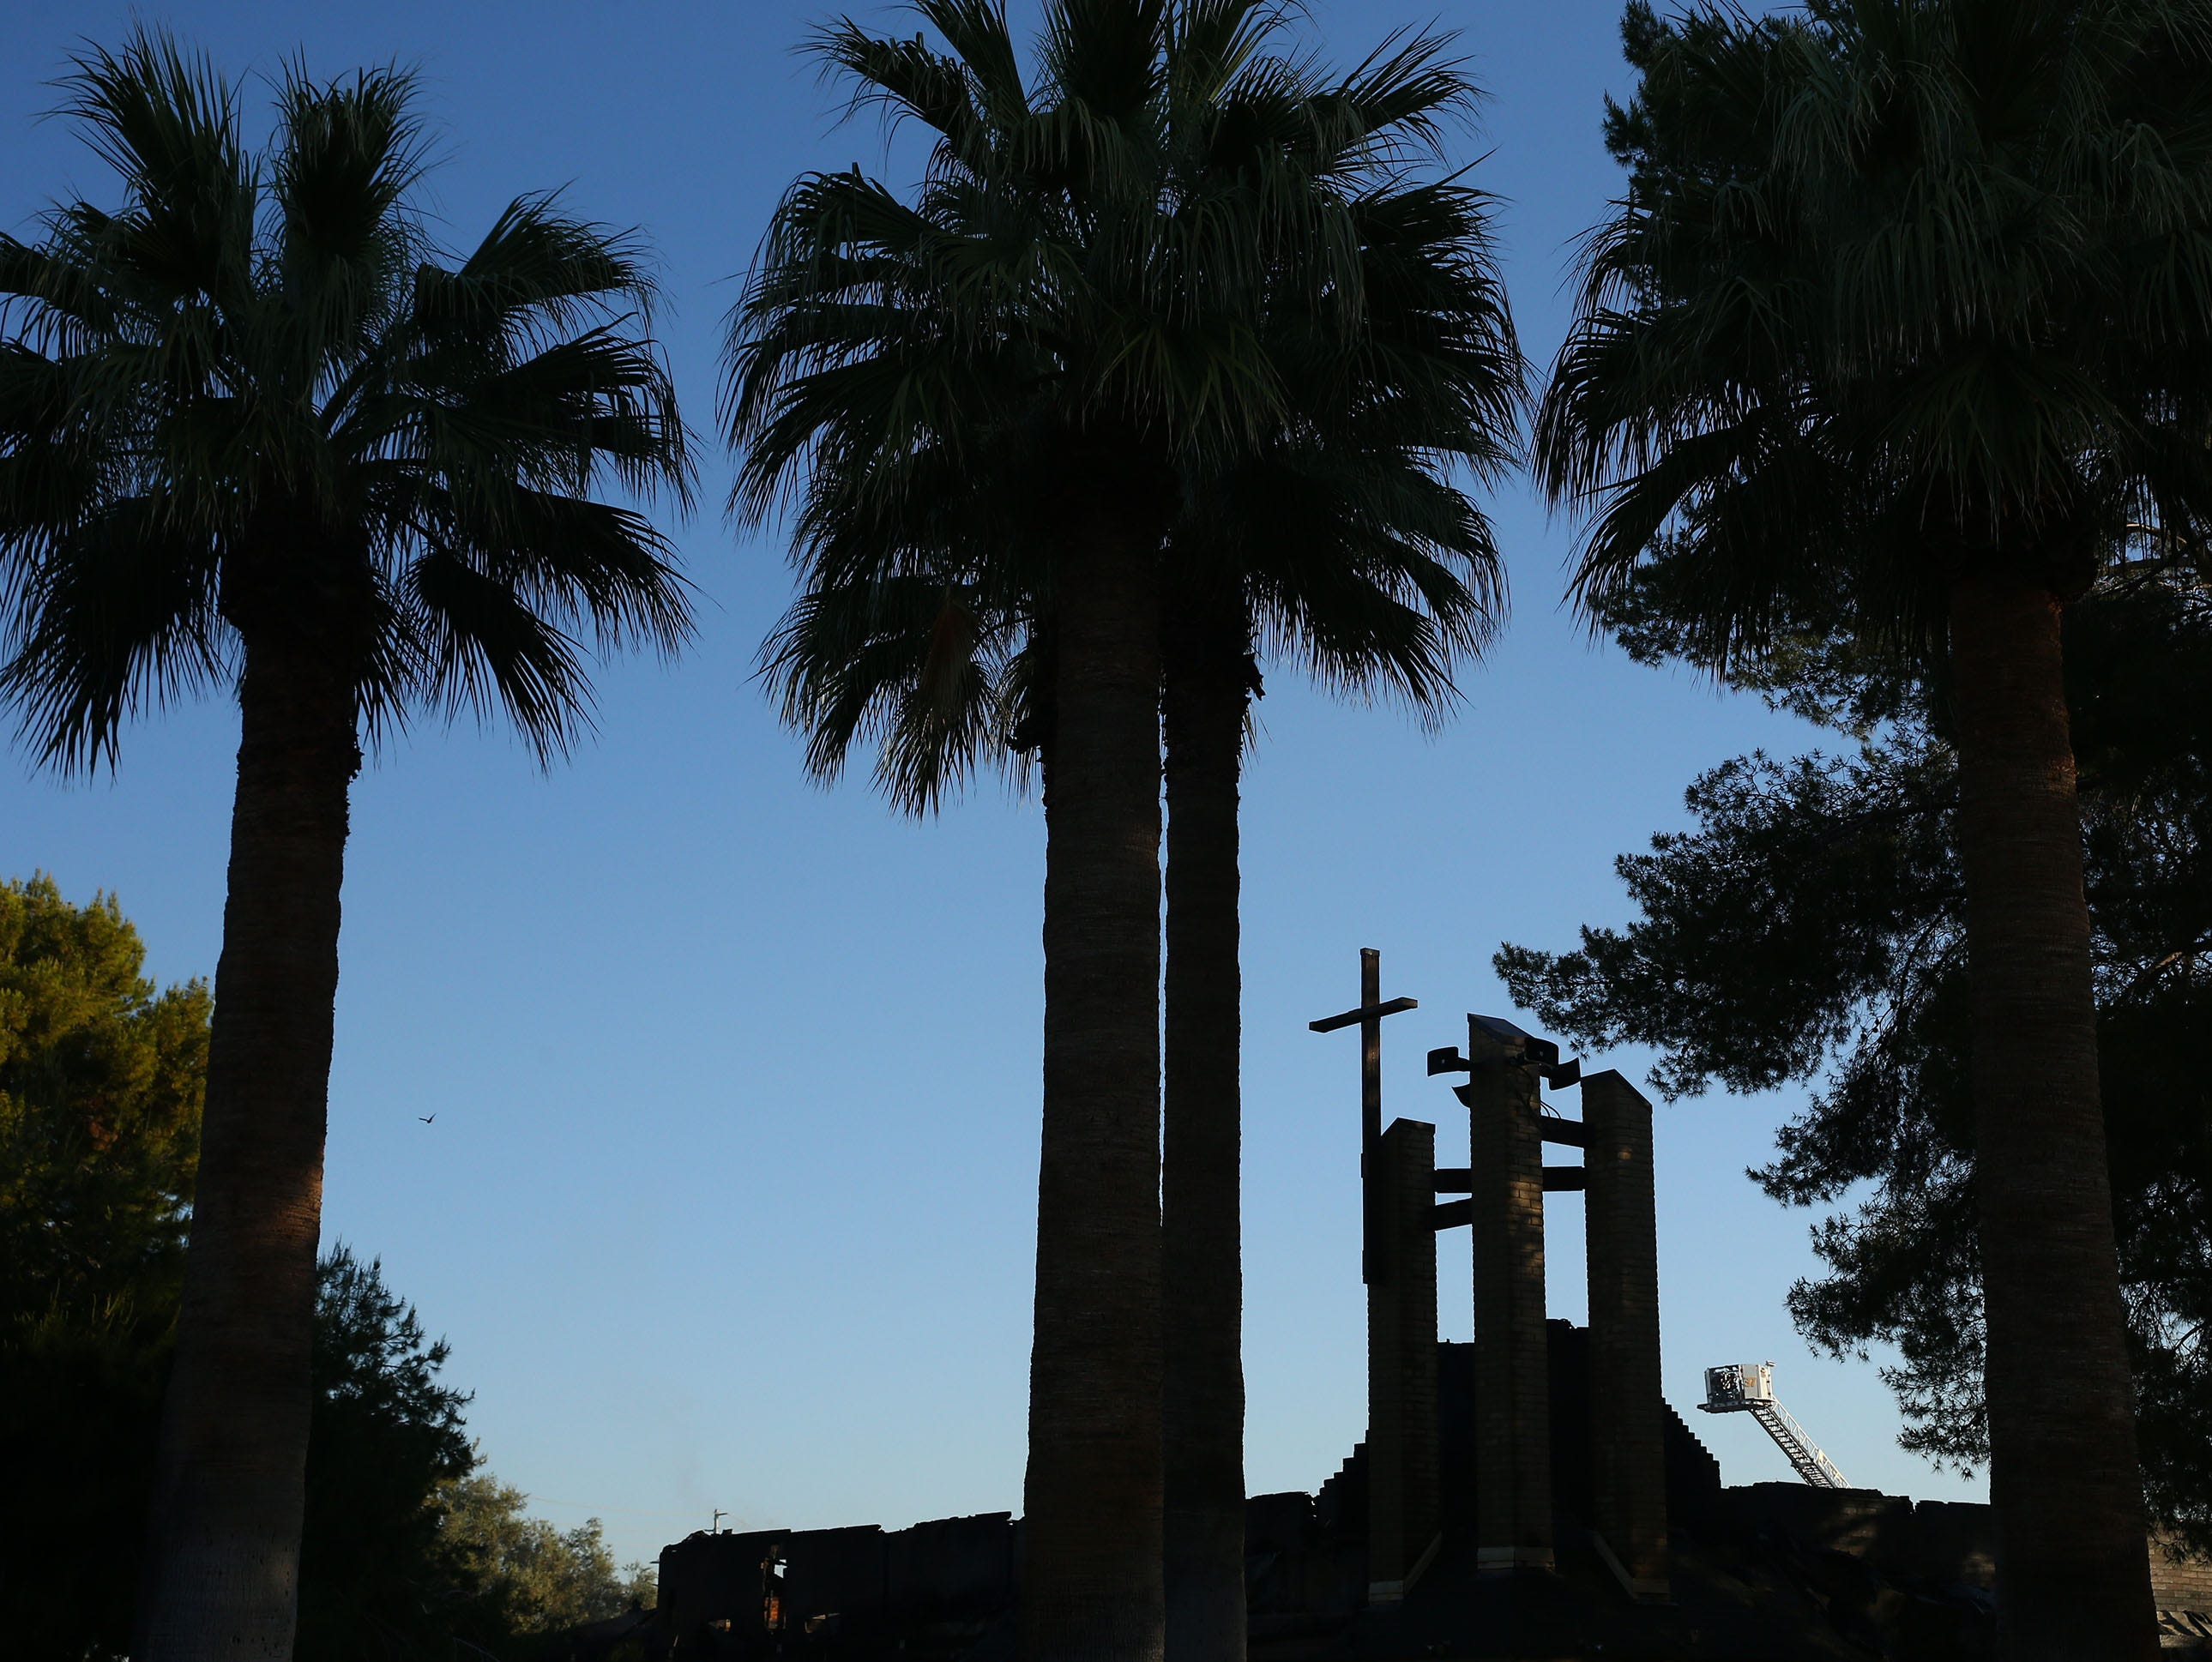 Overnight a fire engulfed St. Joseph Catholic Church on May 1, 2019 near 40th Street and Desert Cove Avenue in Phoenix.